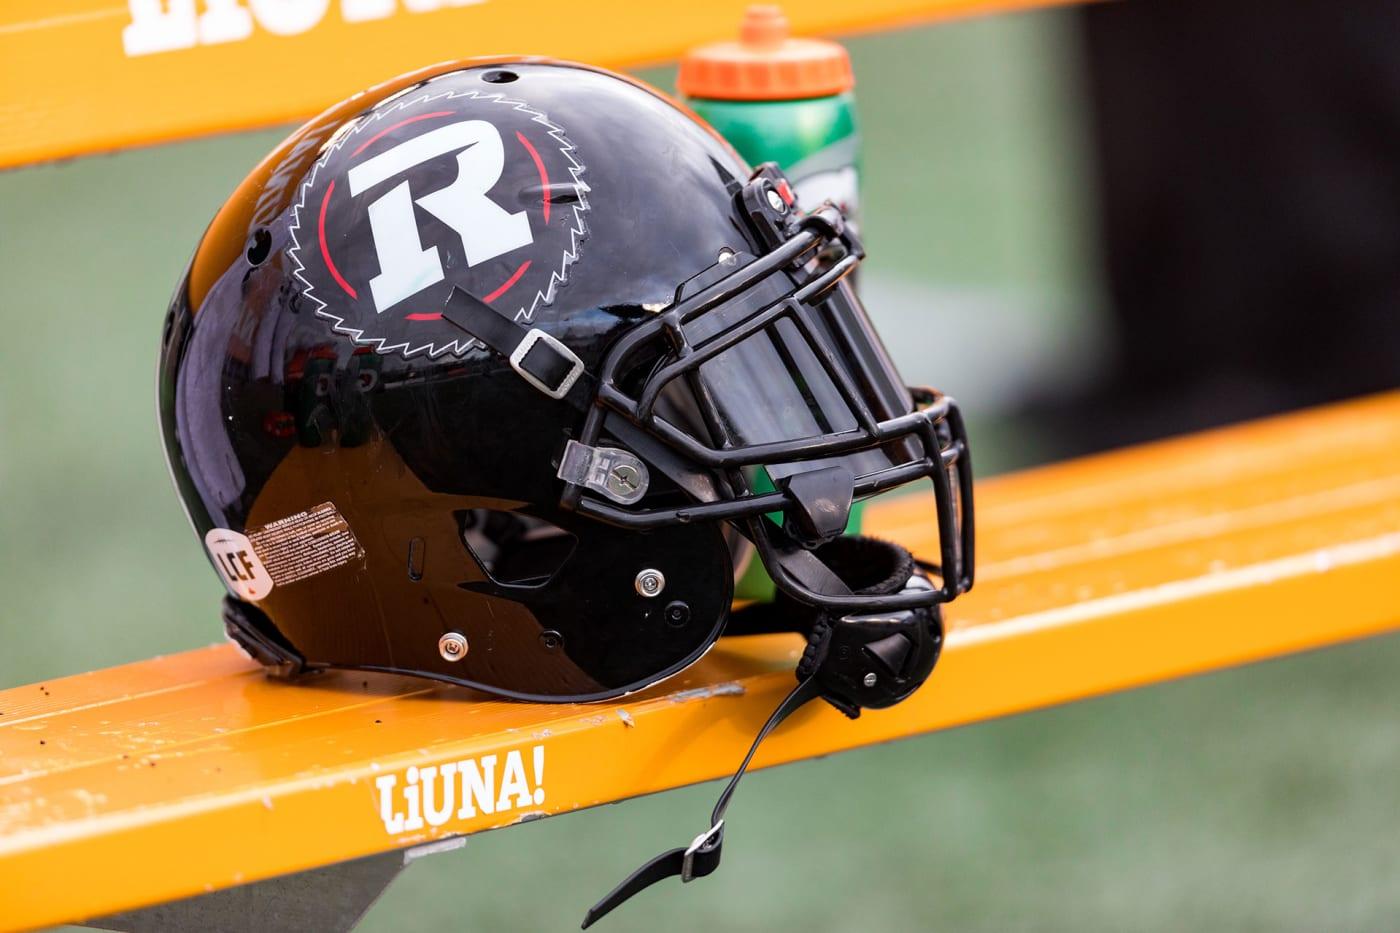 Ottawa Redblacks helmet